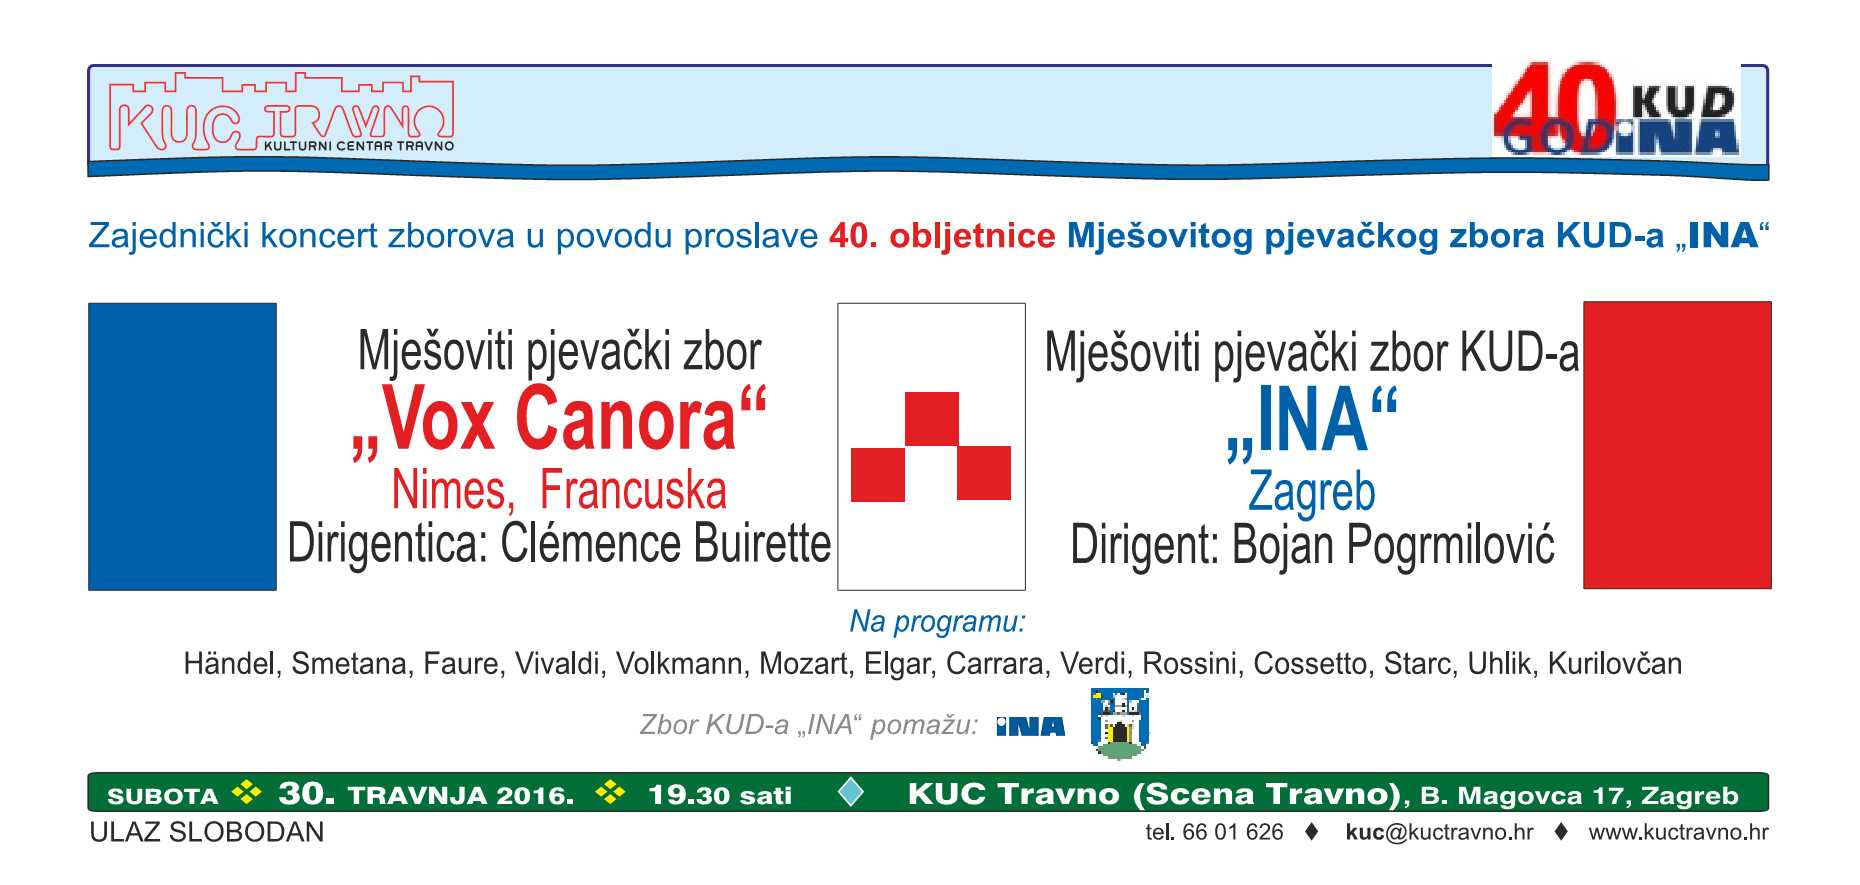 KOncert INA VoxCanoa 30.4.2016